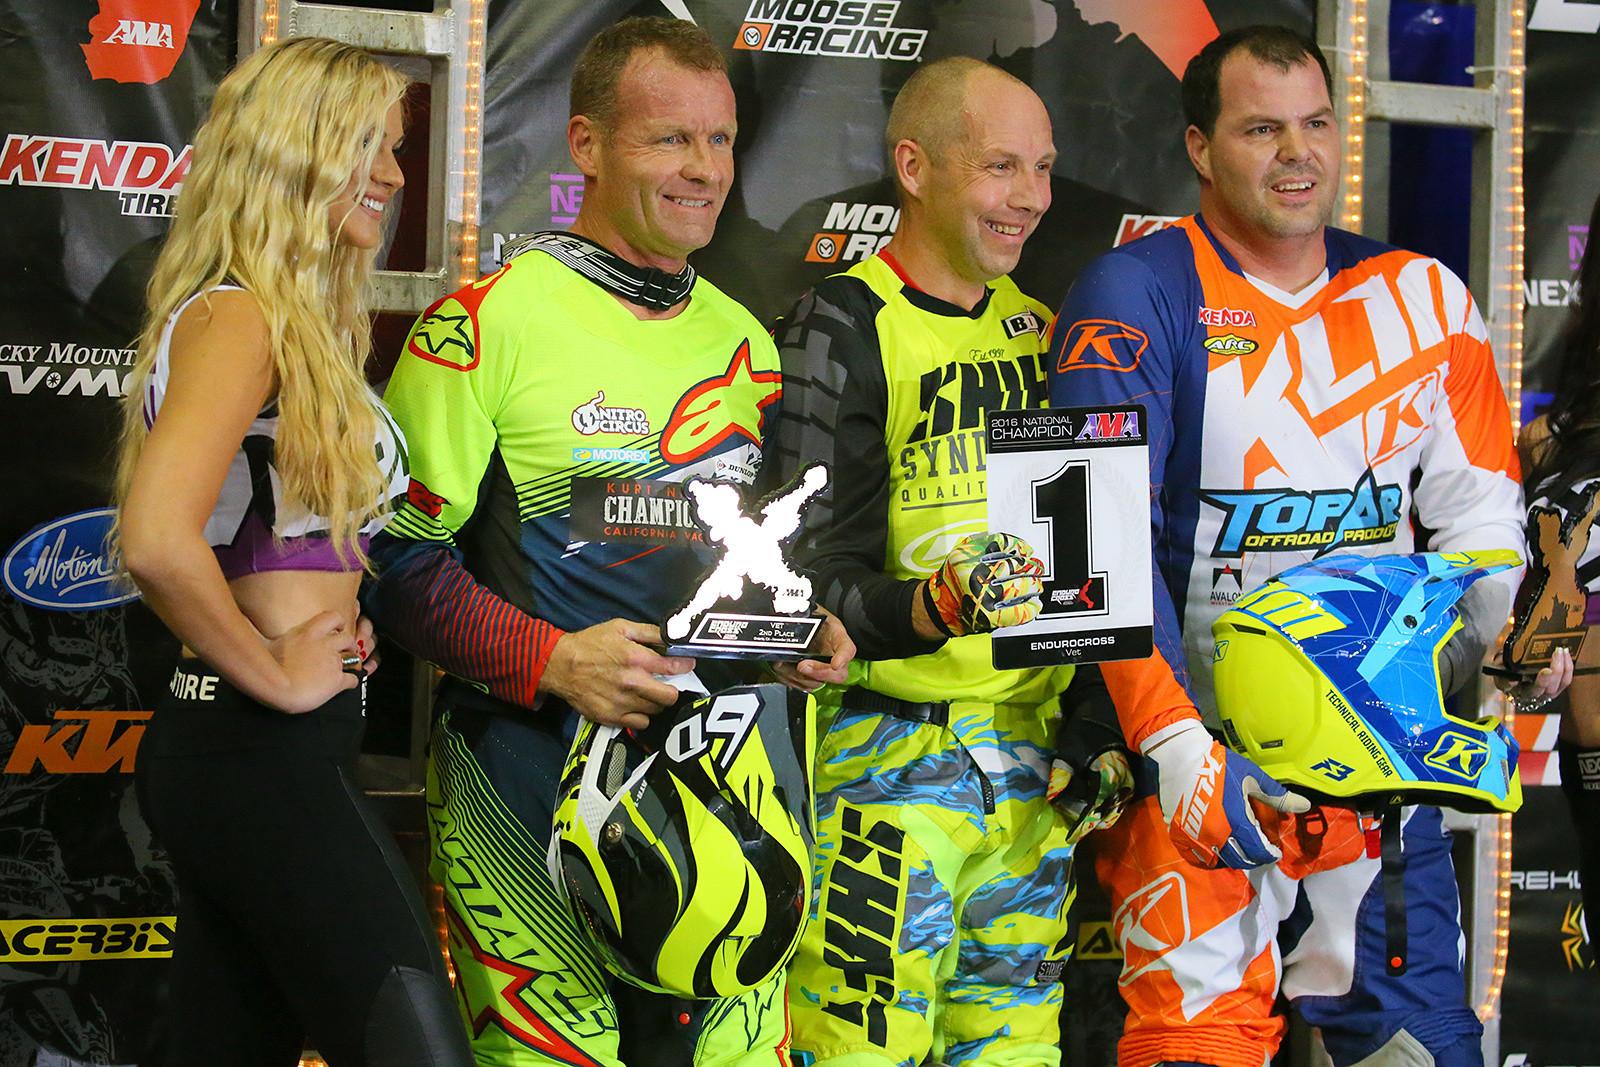 Vet podium - Endurocross Finals - Motocross Pictures - Vital MX